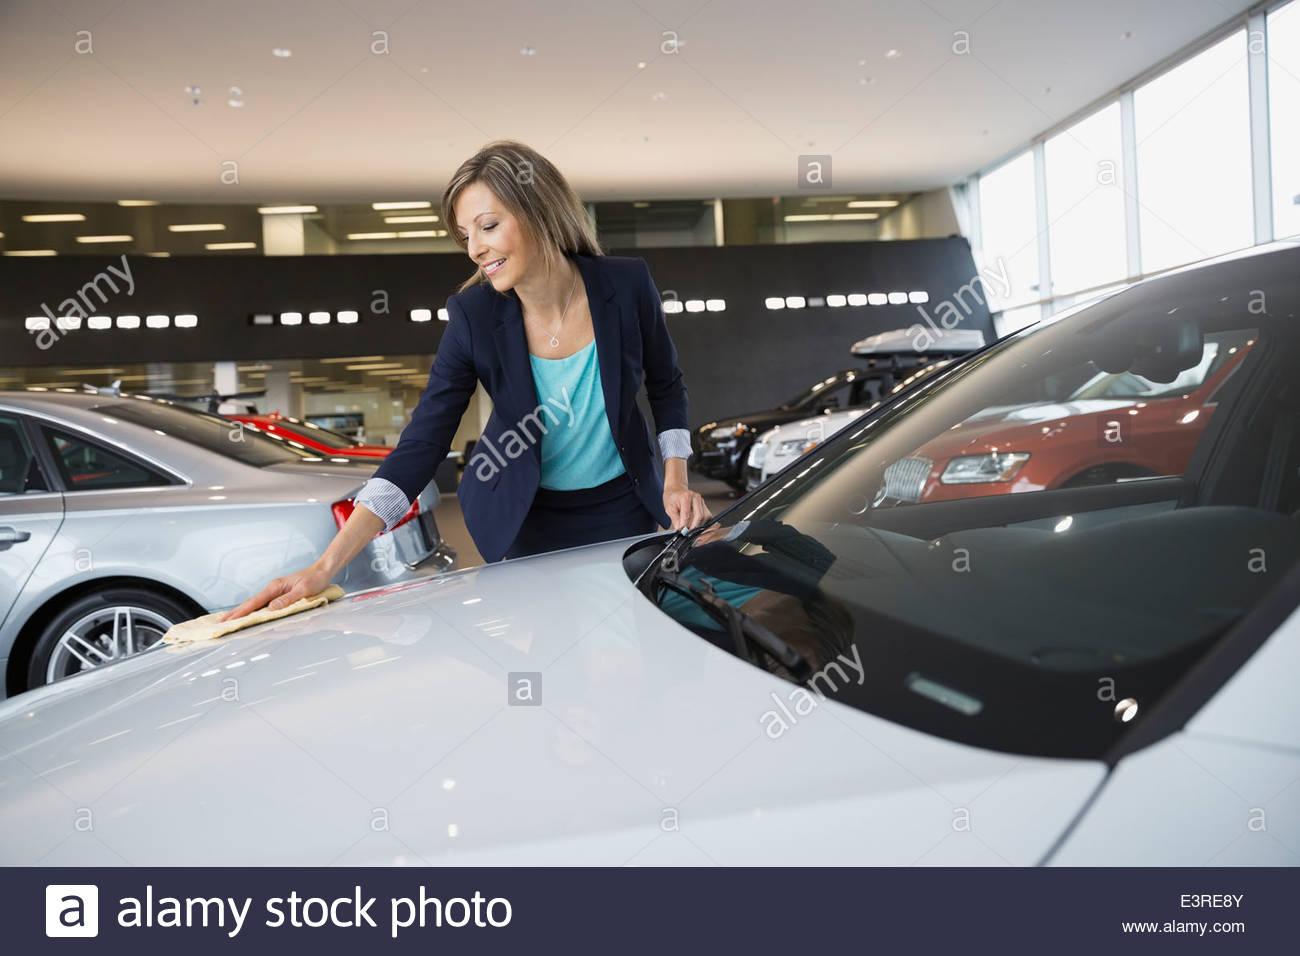 Saleswoman wiping down car in car dealership showroom - Stock Image